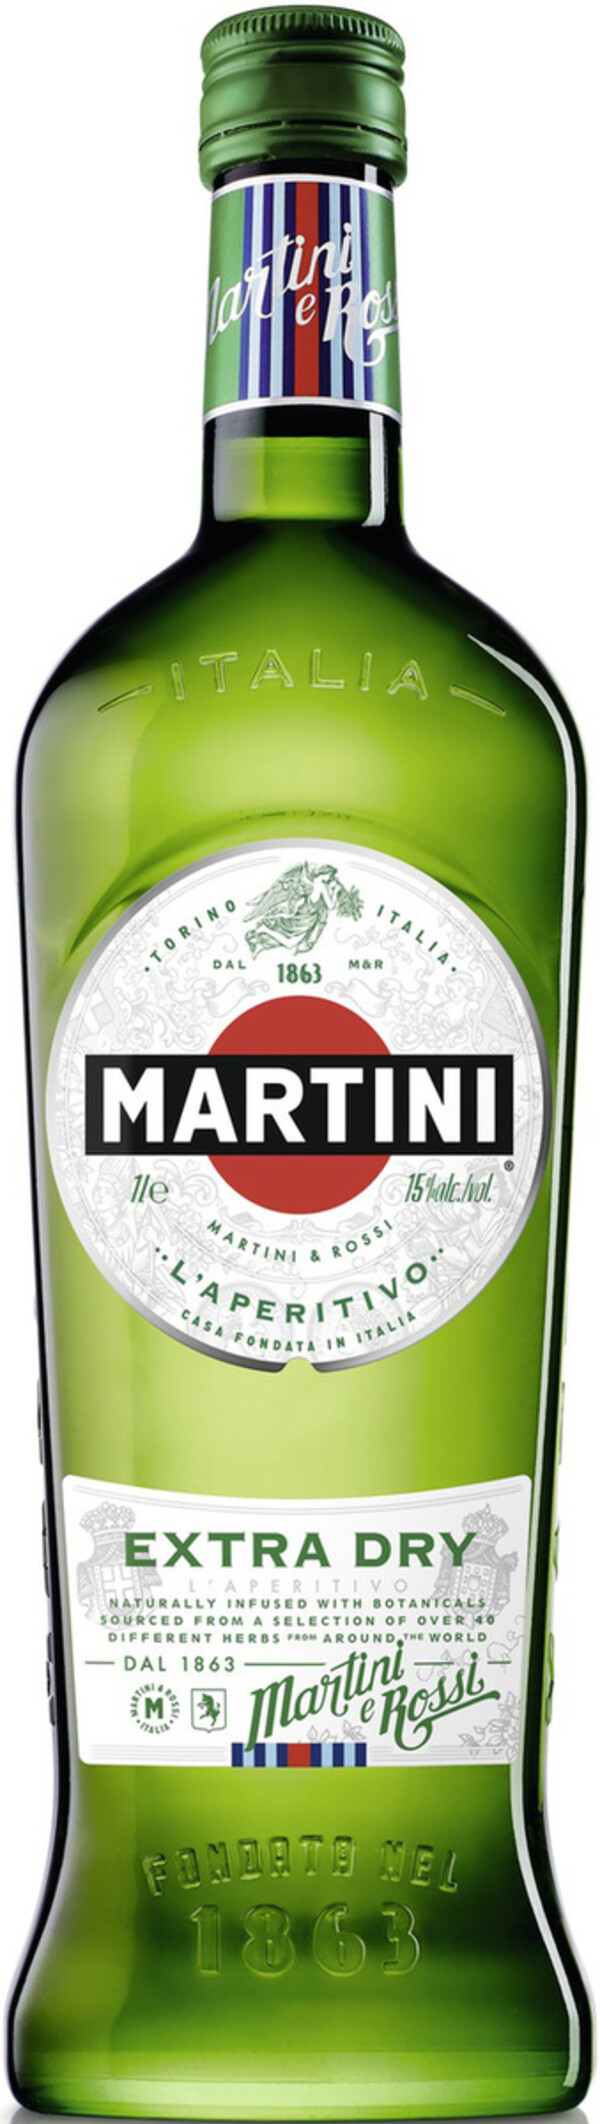 Martini Bianco Extra Dry 0,75 ltr